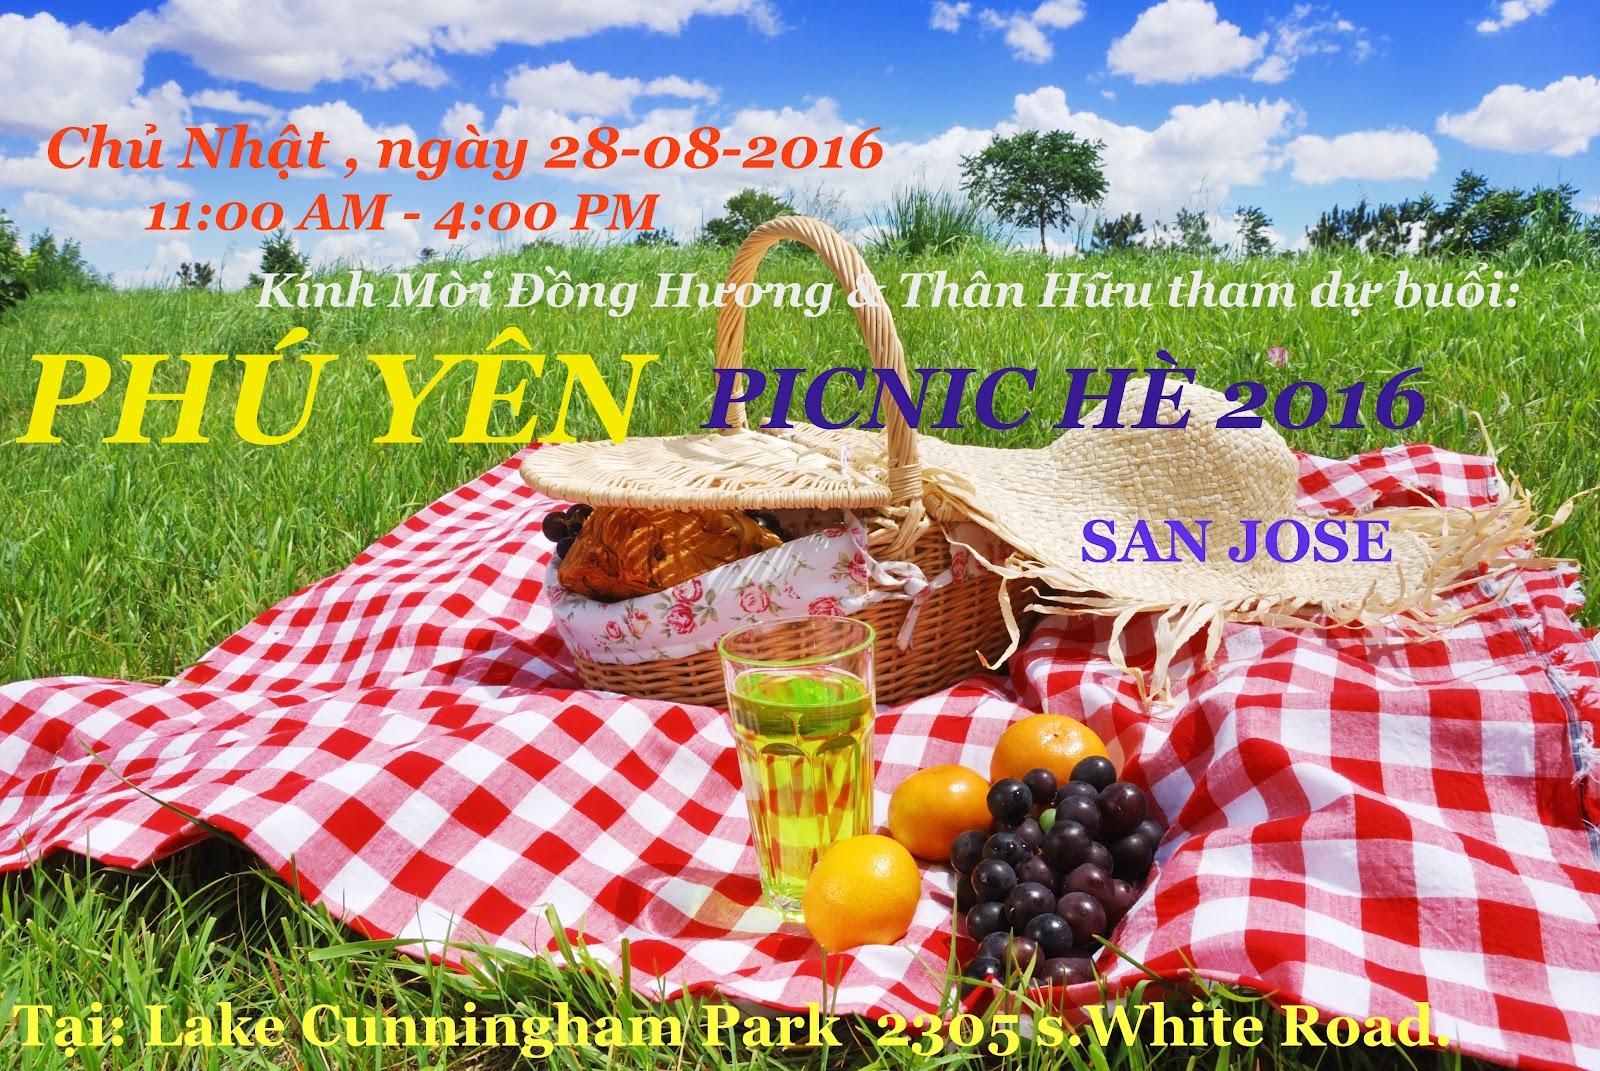 a picnic 4 A.jpg